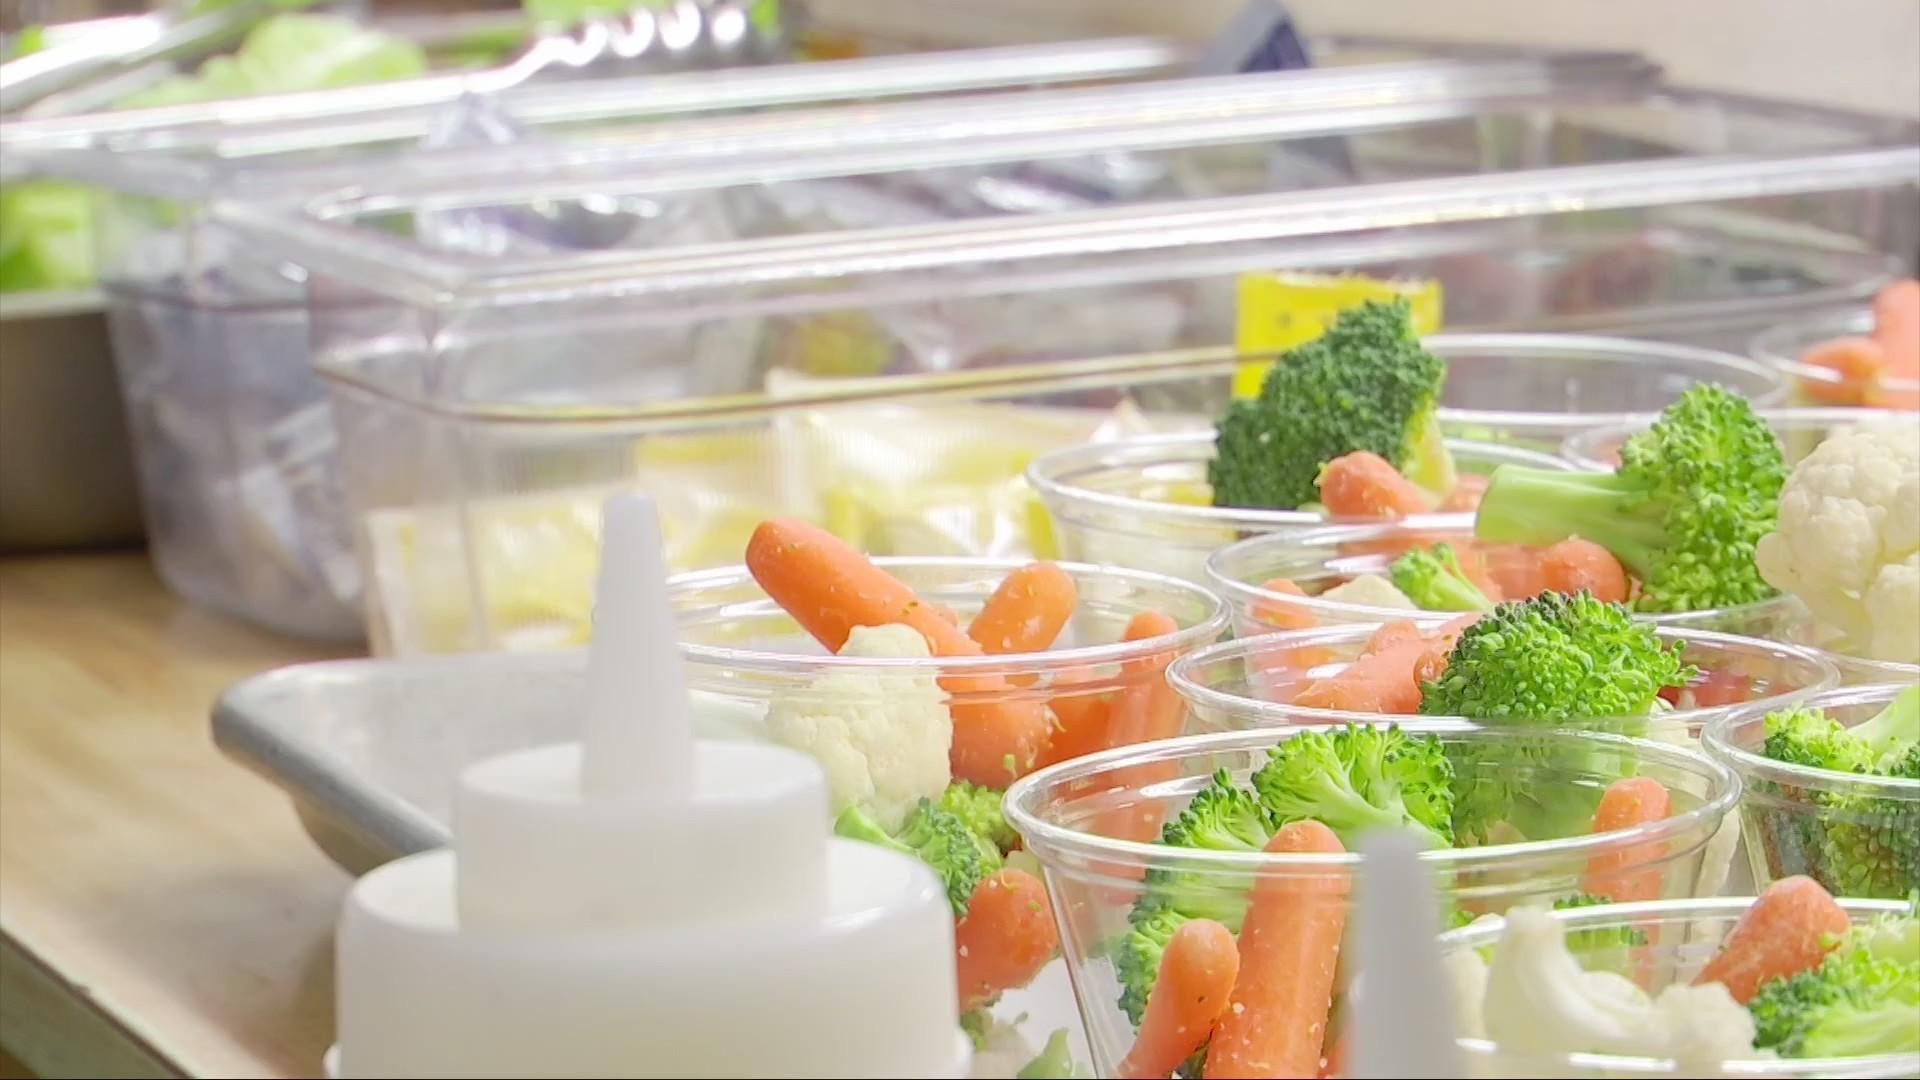 Summer Food Program Kicks Off for West Virginia Students